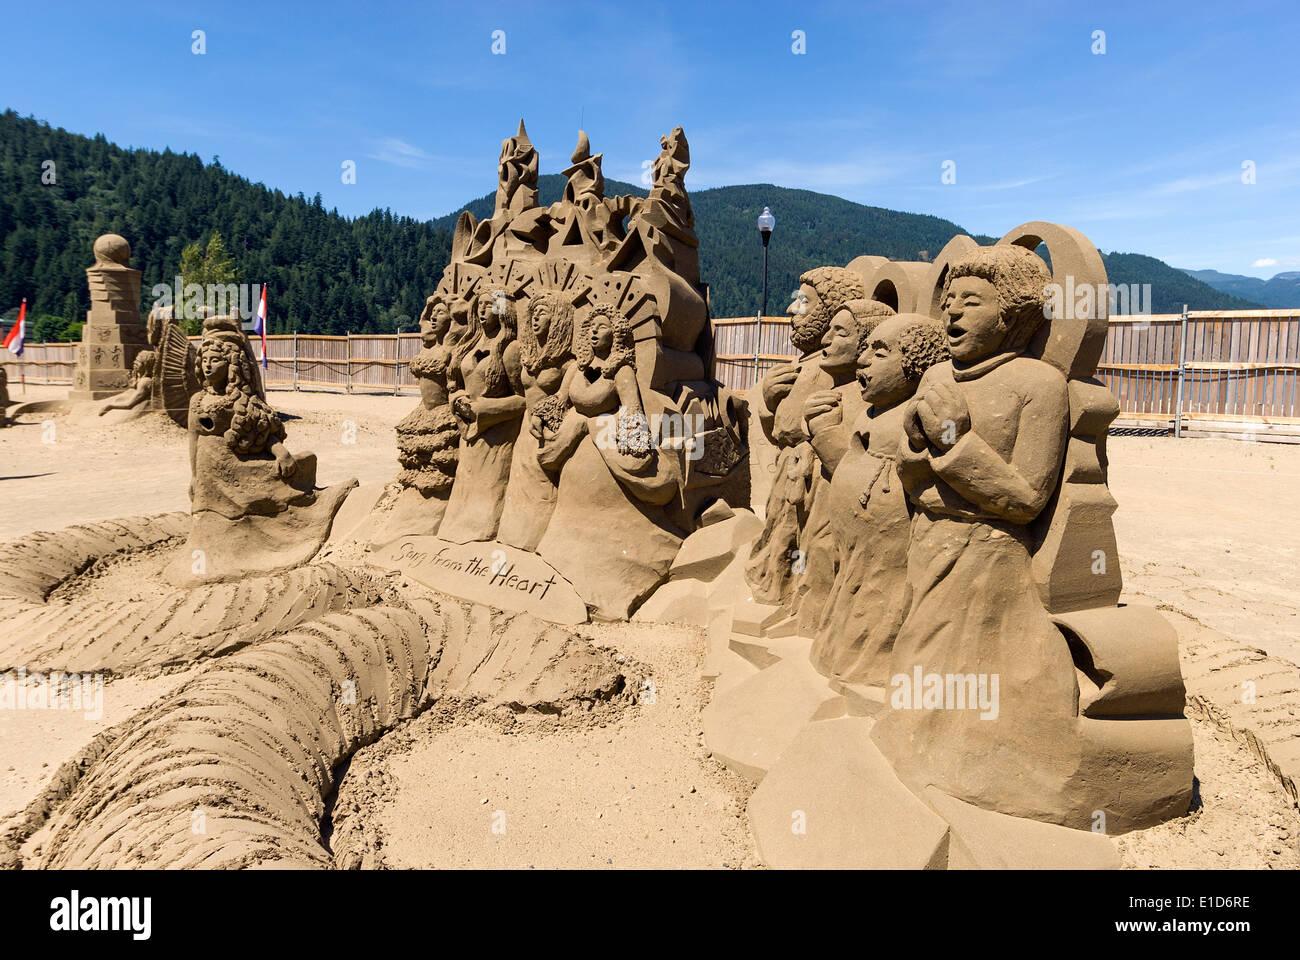 Elk203-1434 Canada, British Columbia, Harrison Hot Springs, le sculture di sabbia Immagini Stock